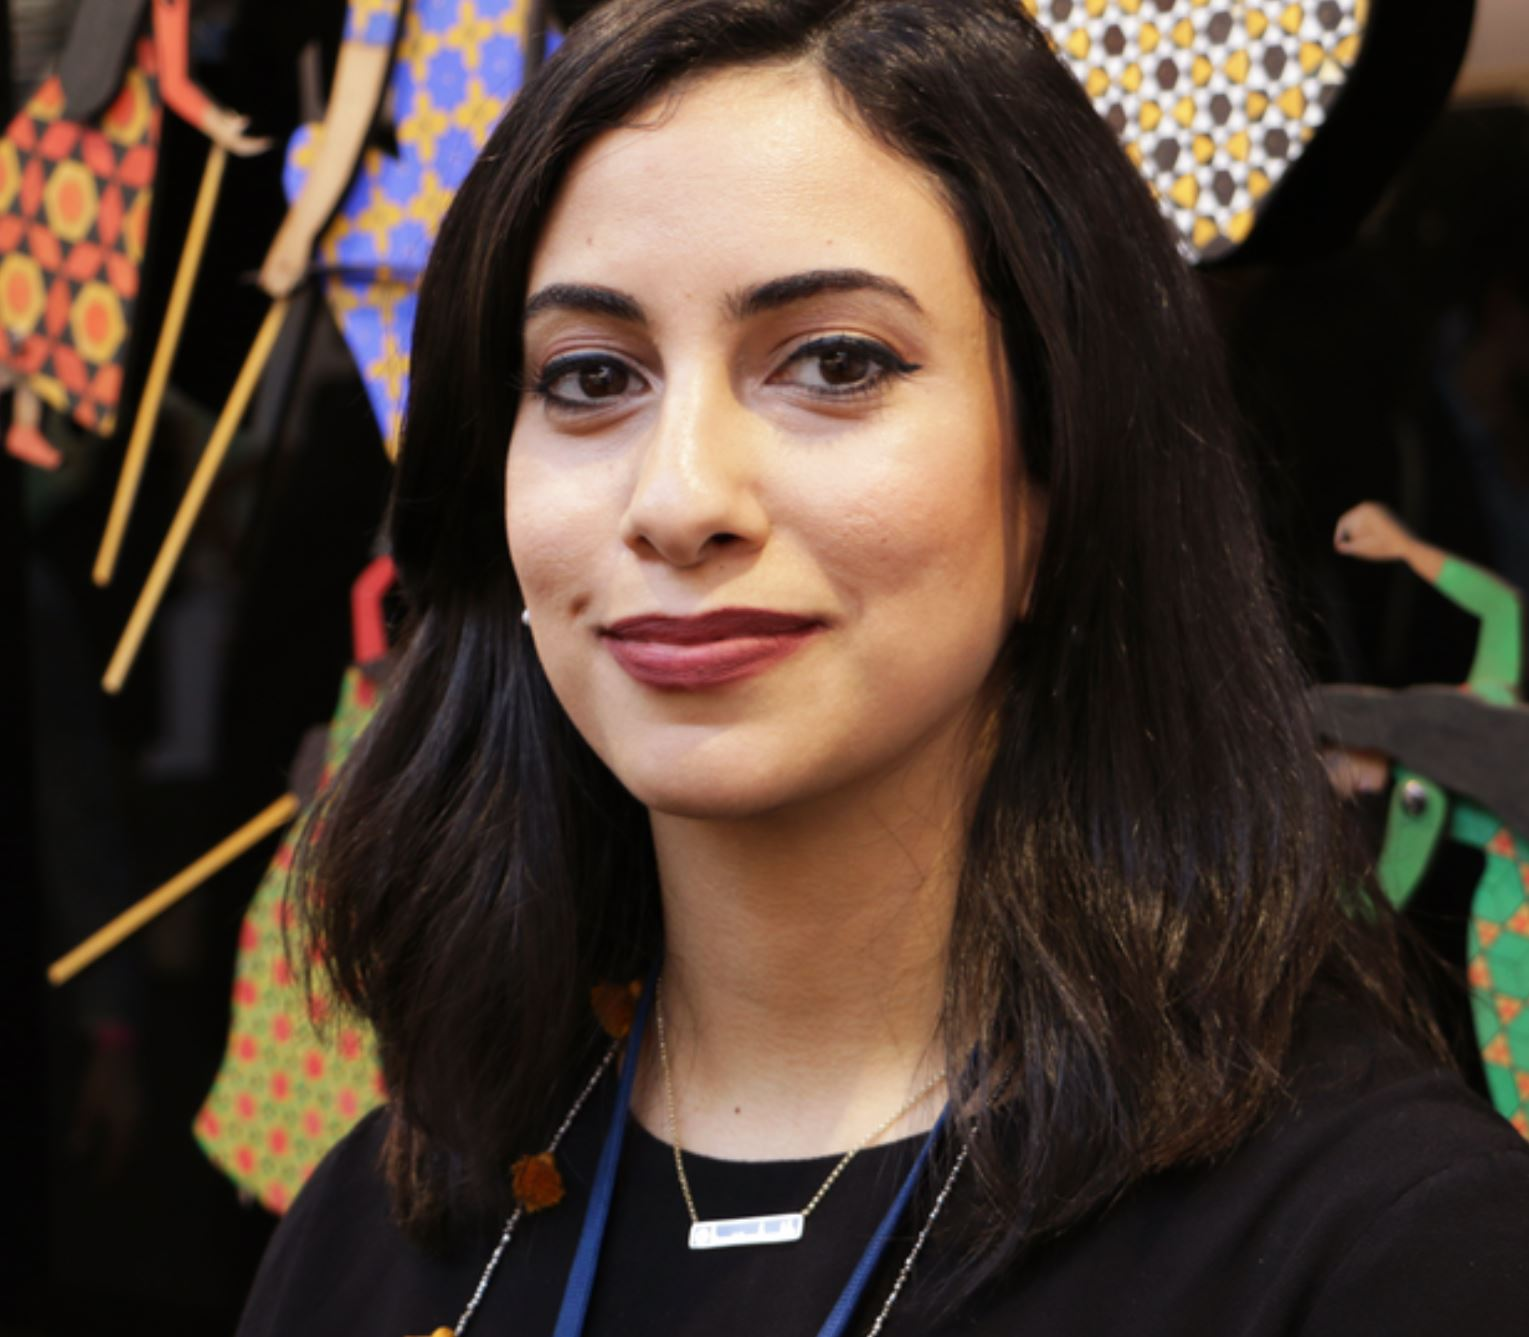 Sarah Al Abdali